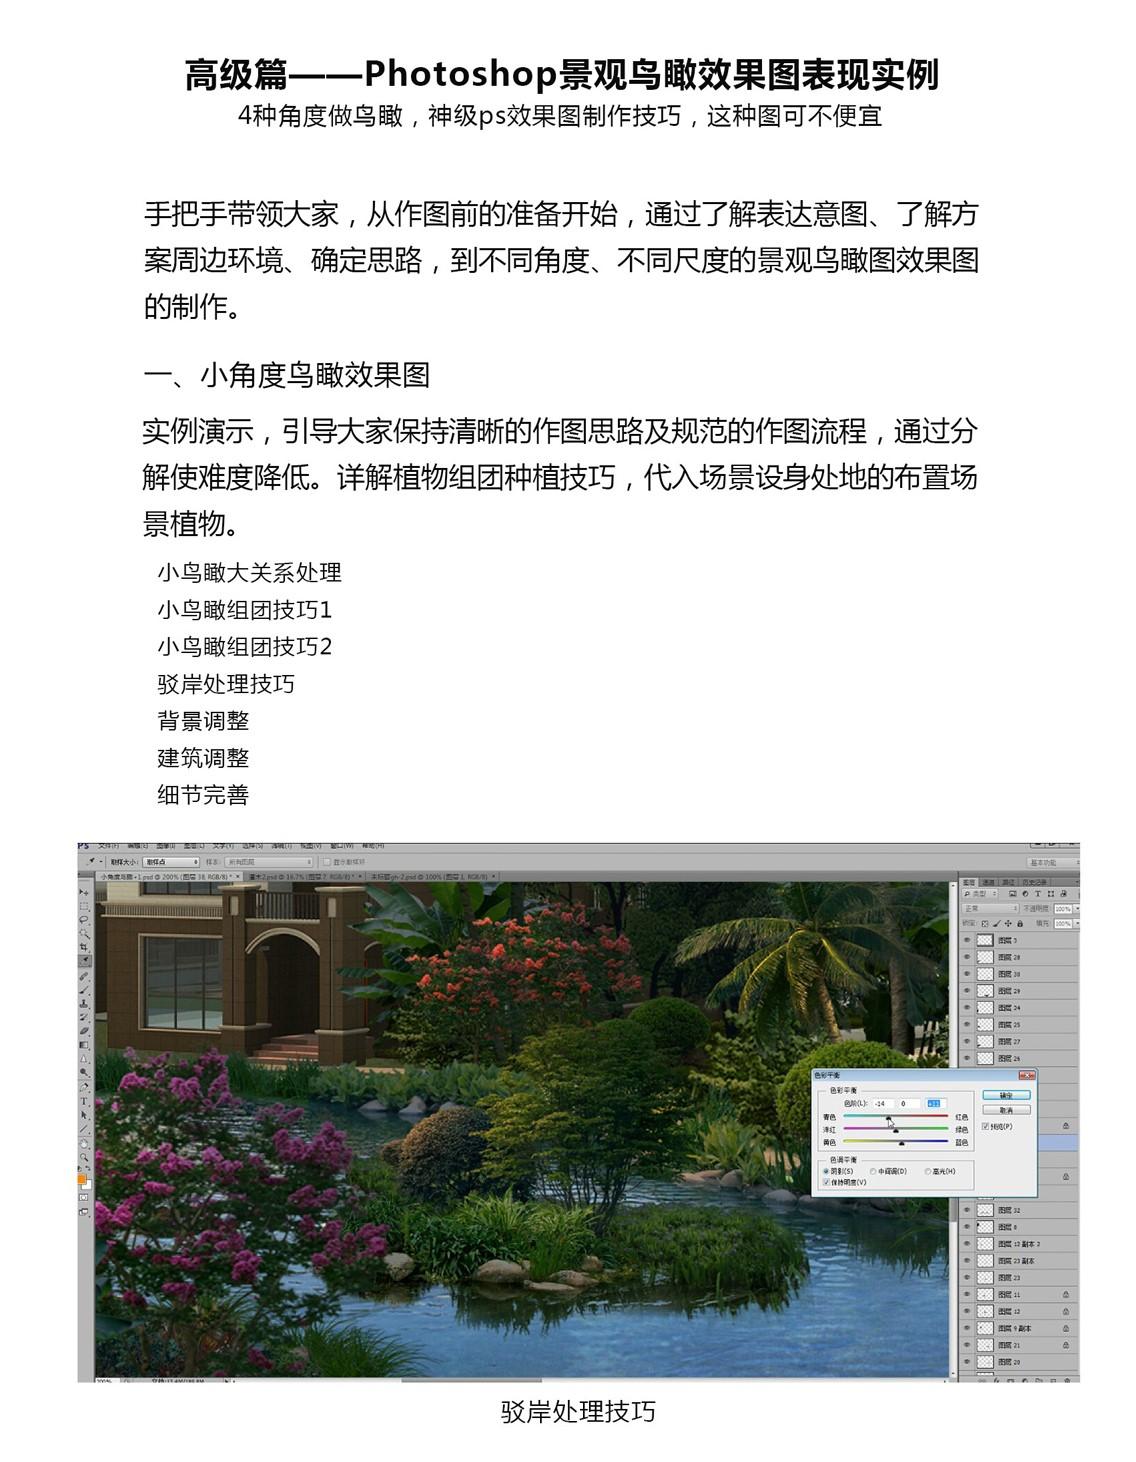 ps景观鸟瞰效果图表现实例,Photoshop景观效果图,景观效果图表现,ps景观效果图